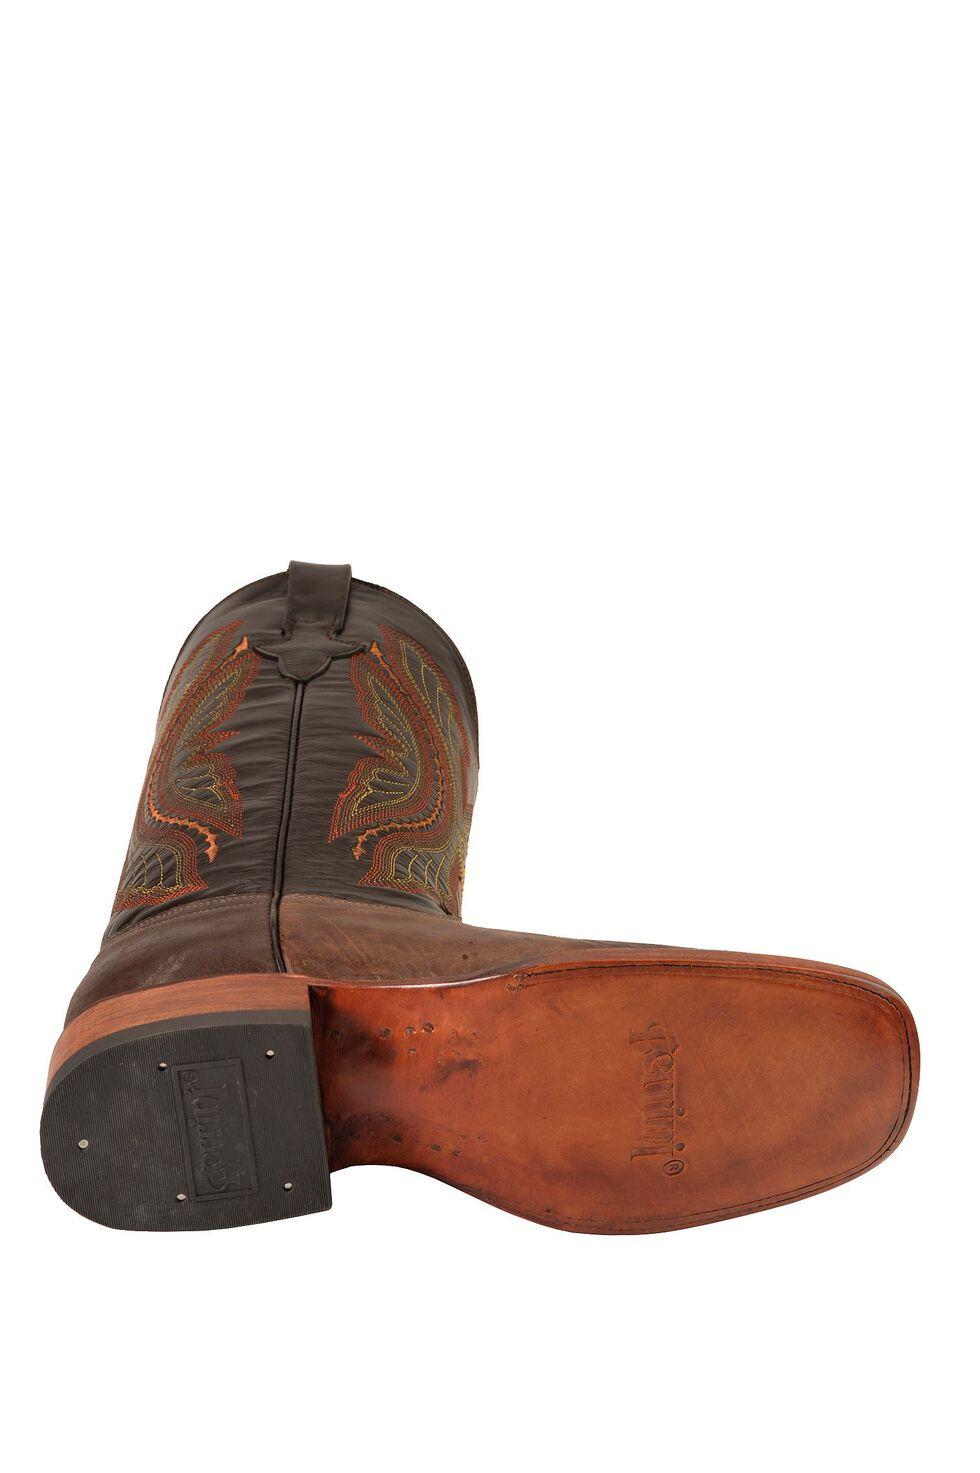 Ferrini Chocolate Distressed Kangaroo Cowboy Boots - Wide Square Toe, Chocolate, hi-res